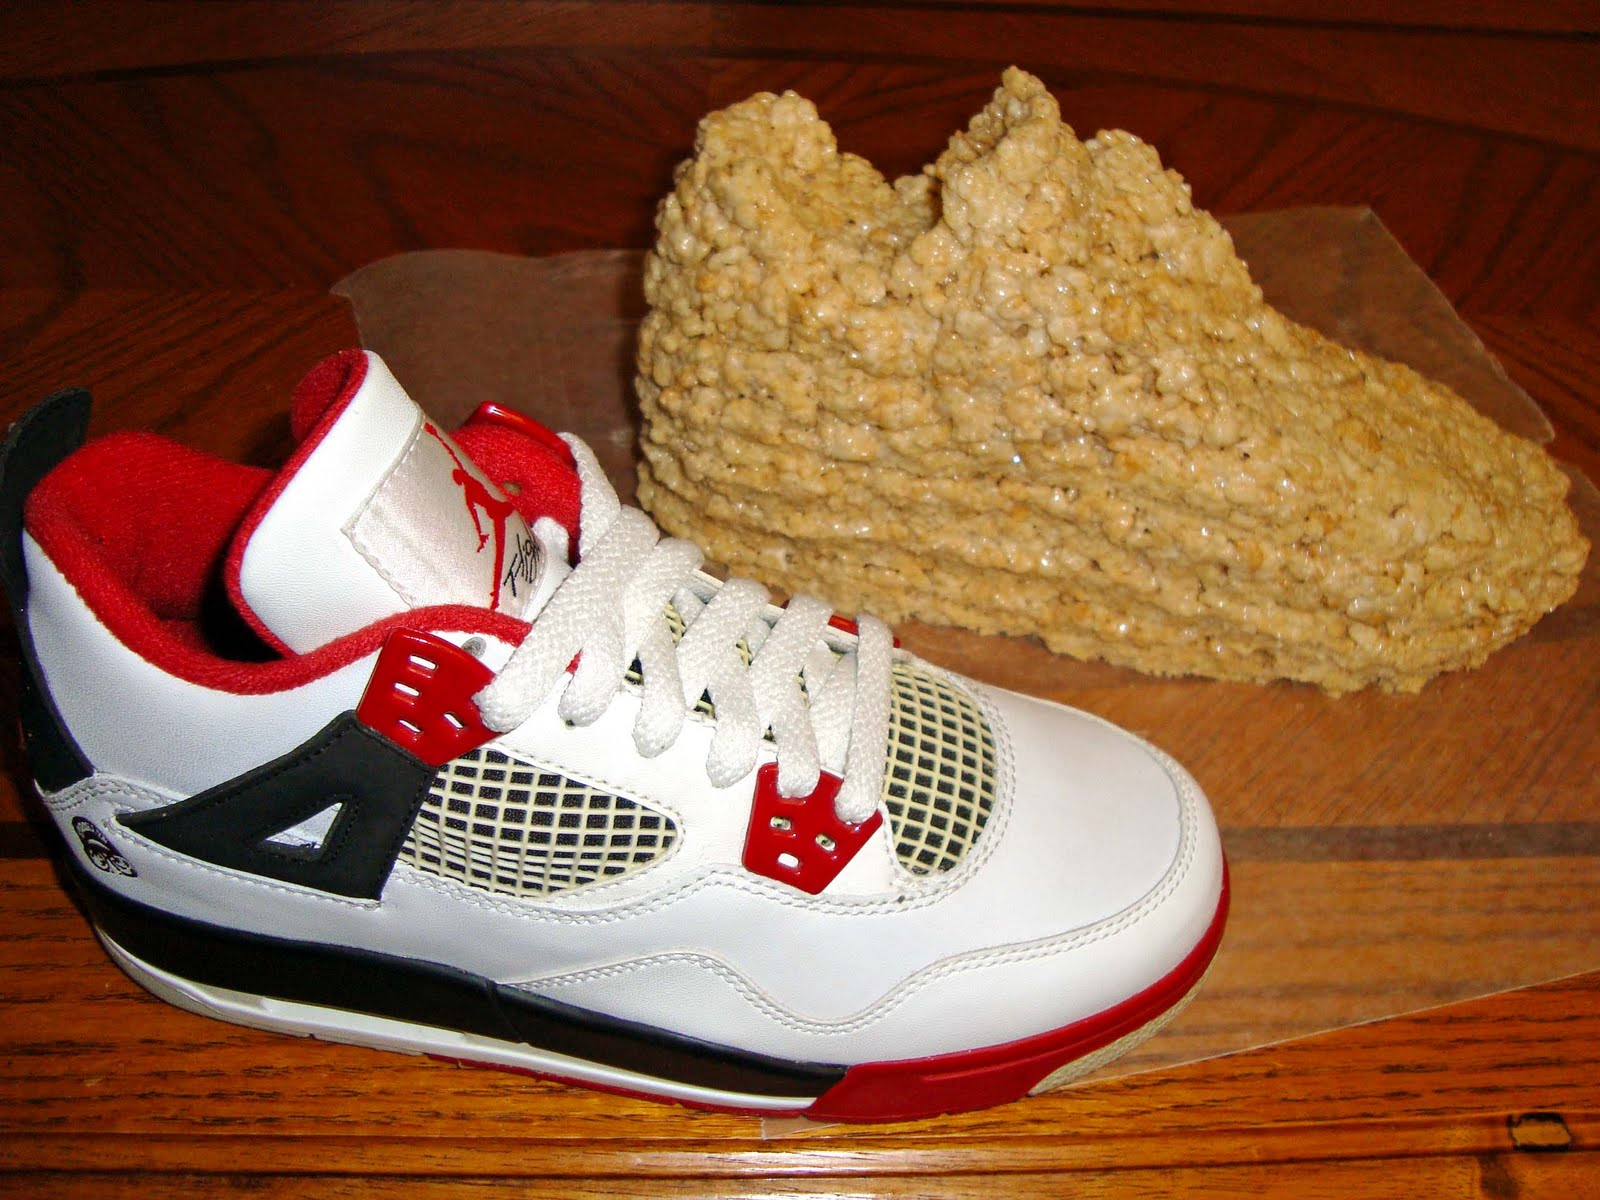 Cake Shop Jordan